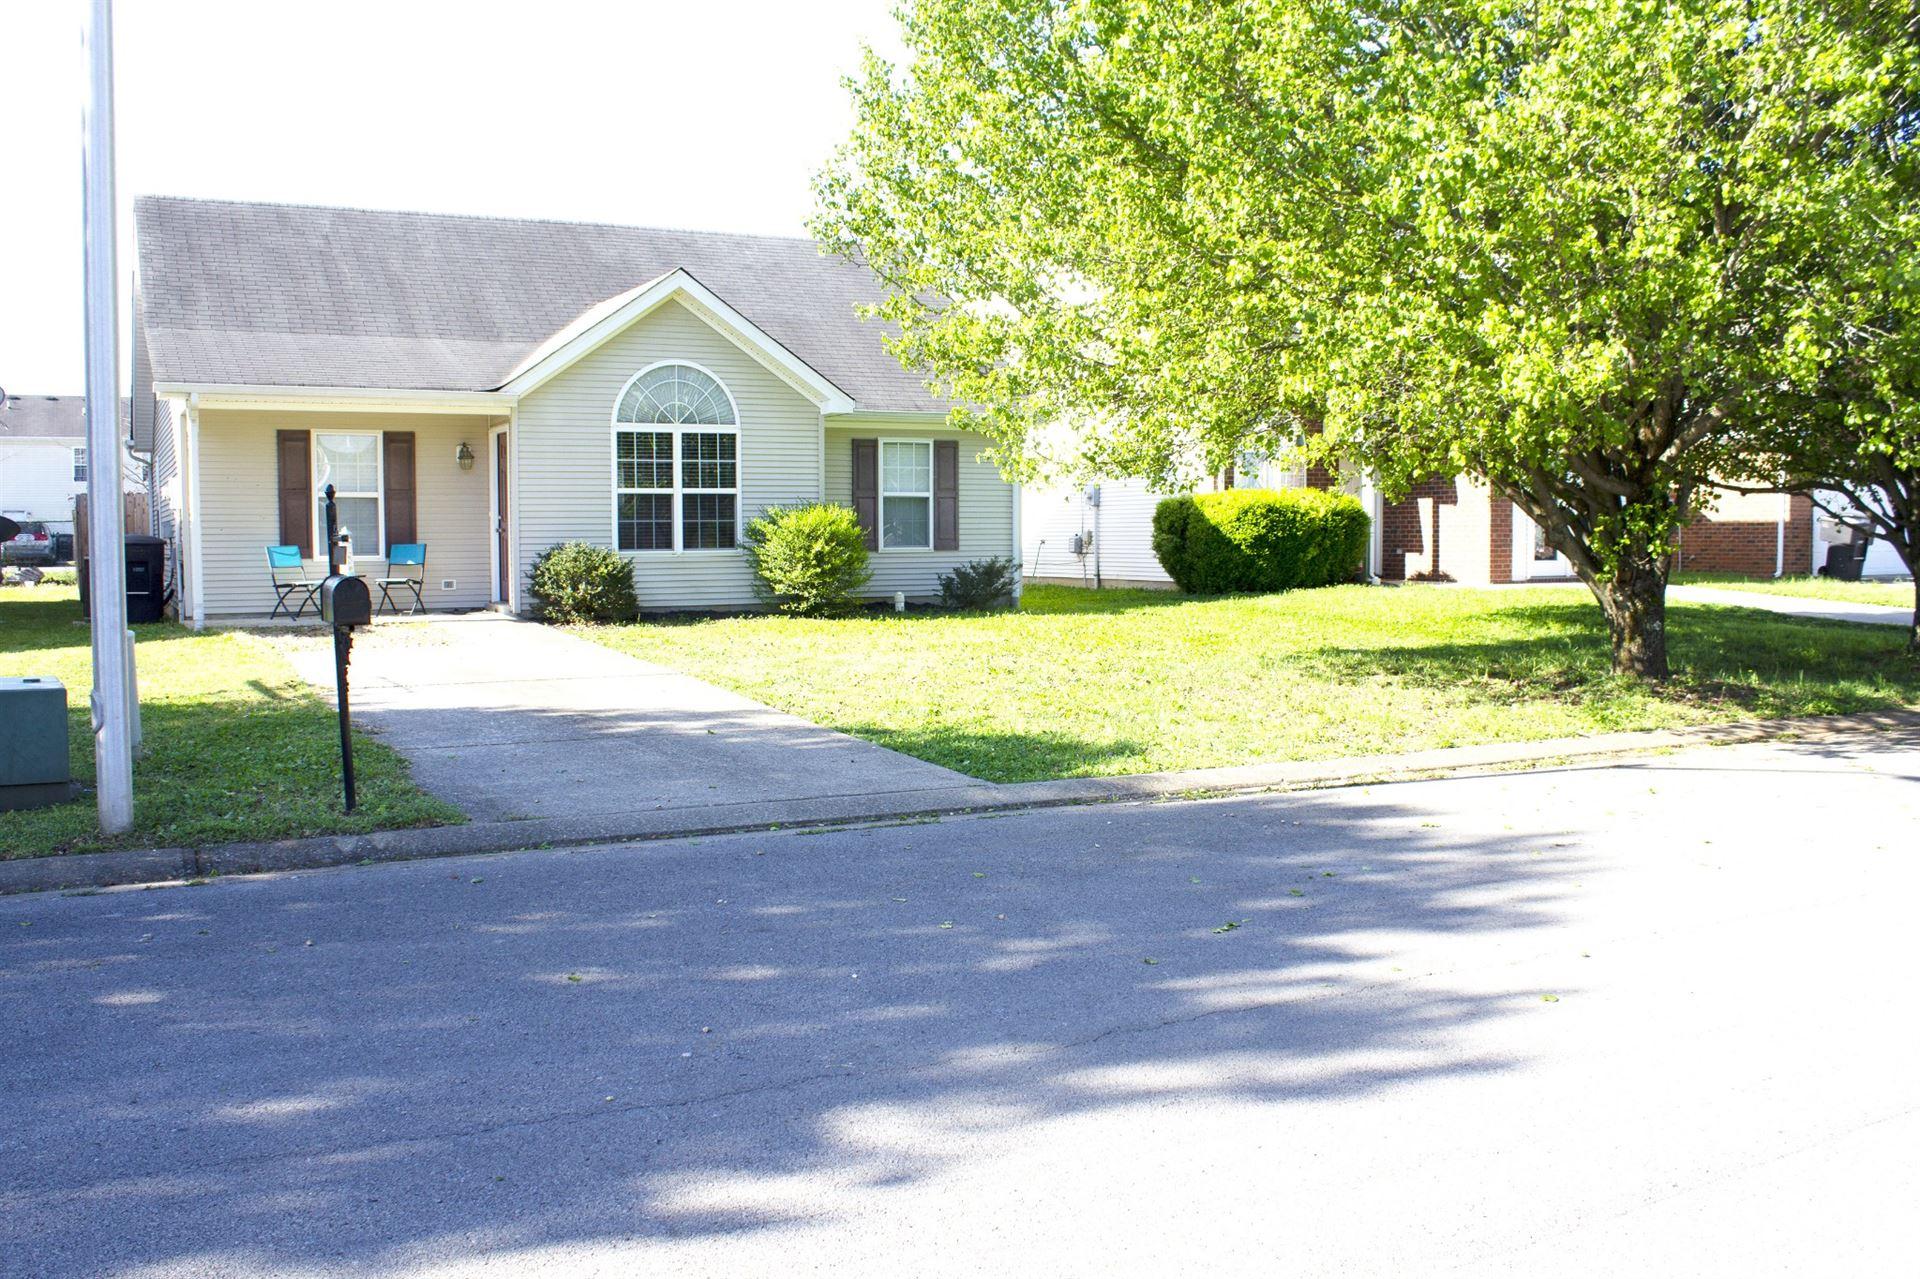 1512 Rochester Dr, Murfreesboro, TN 37130 - MLS#: 2245070